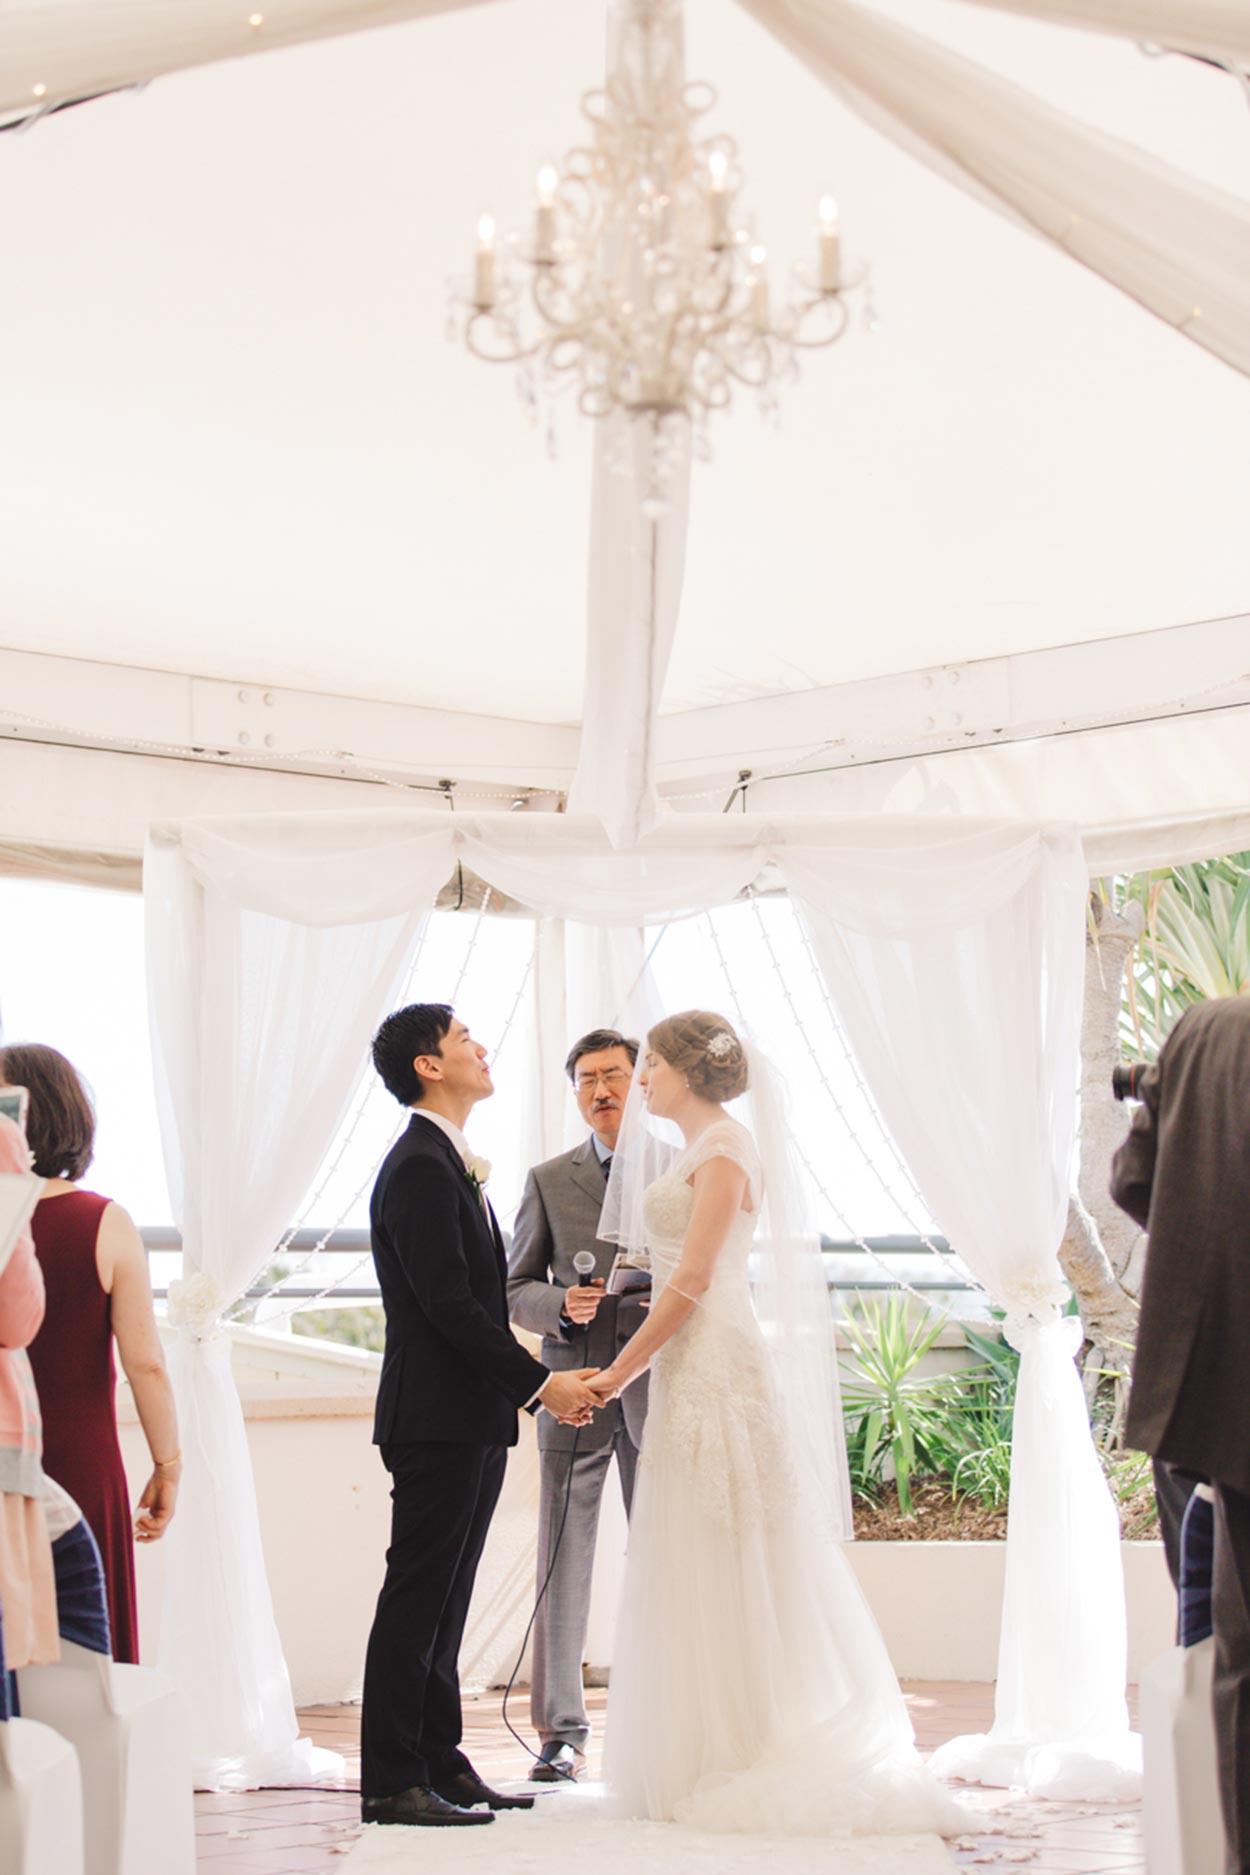 Brisbane Pre Wedding Destination Photographers, Australia - Maleny, Sunshine Coast, Queensland Elopement Photography